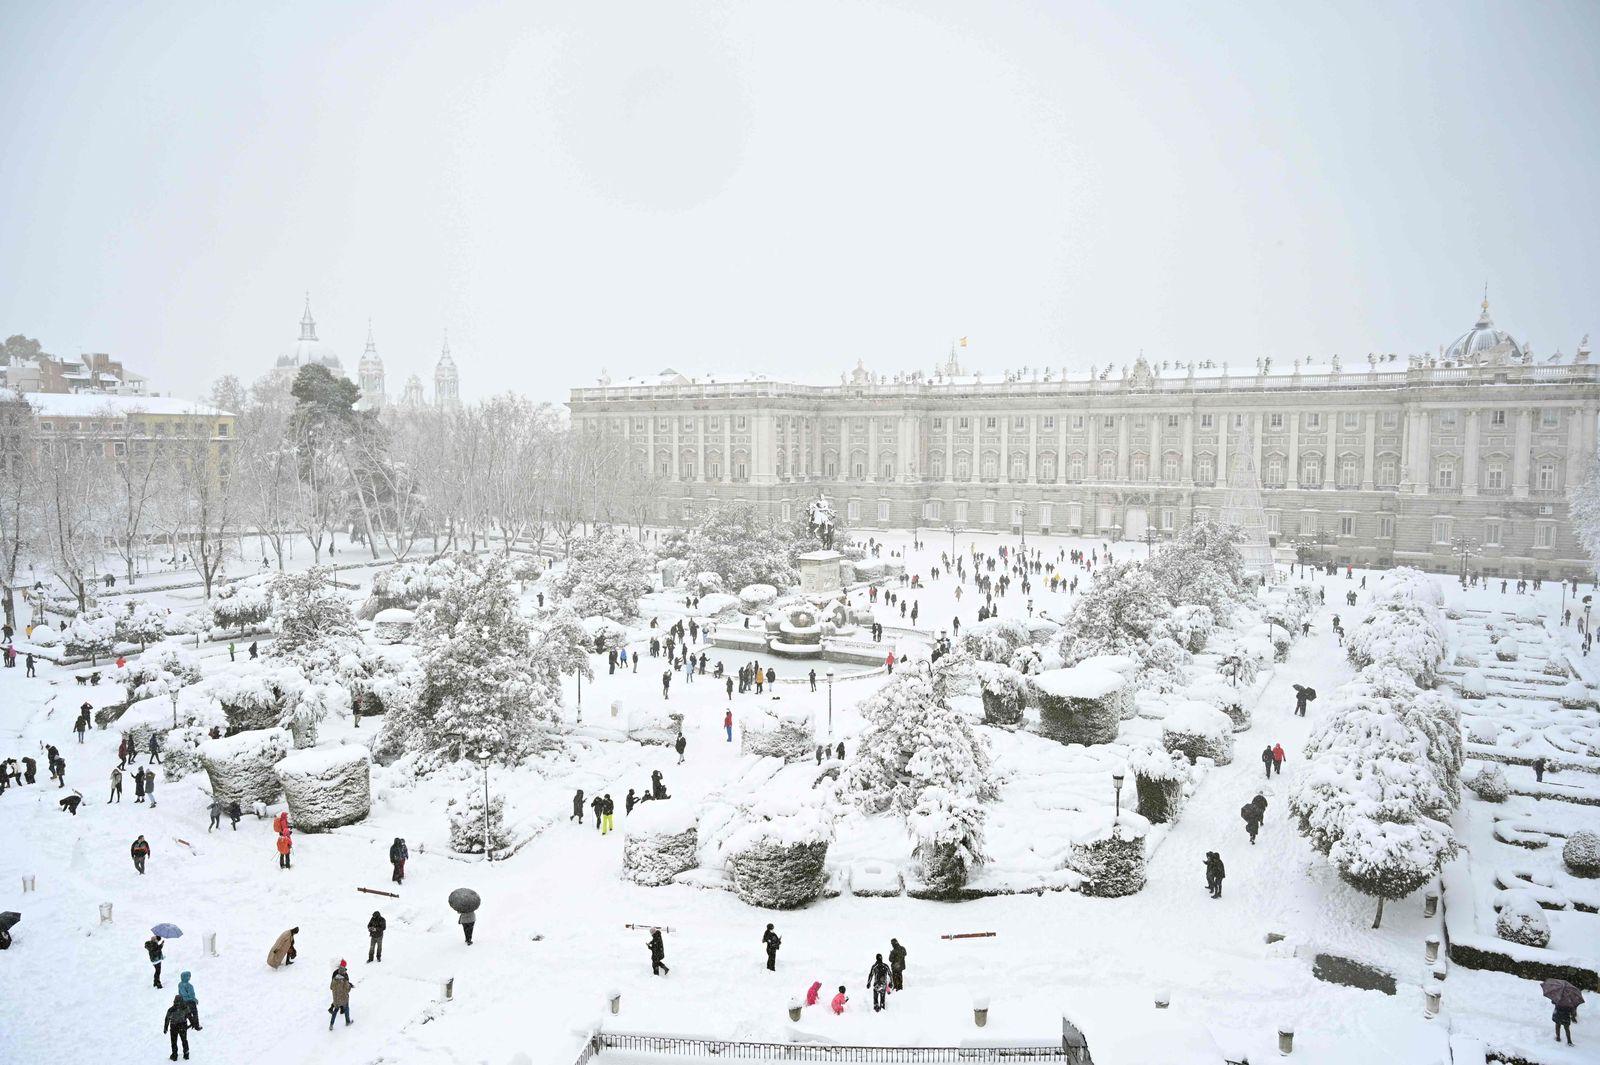 TOPSHOT-SPAIN-WEATHER-SNOW